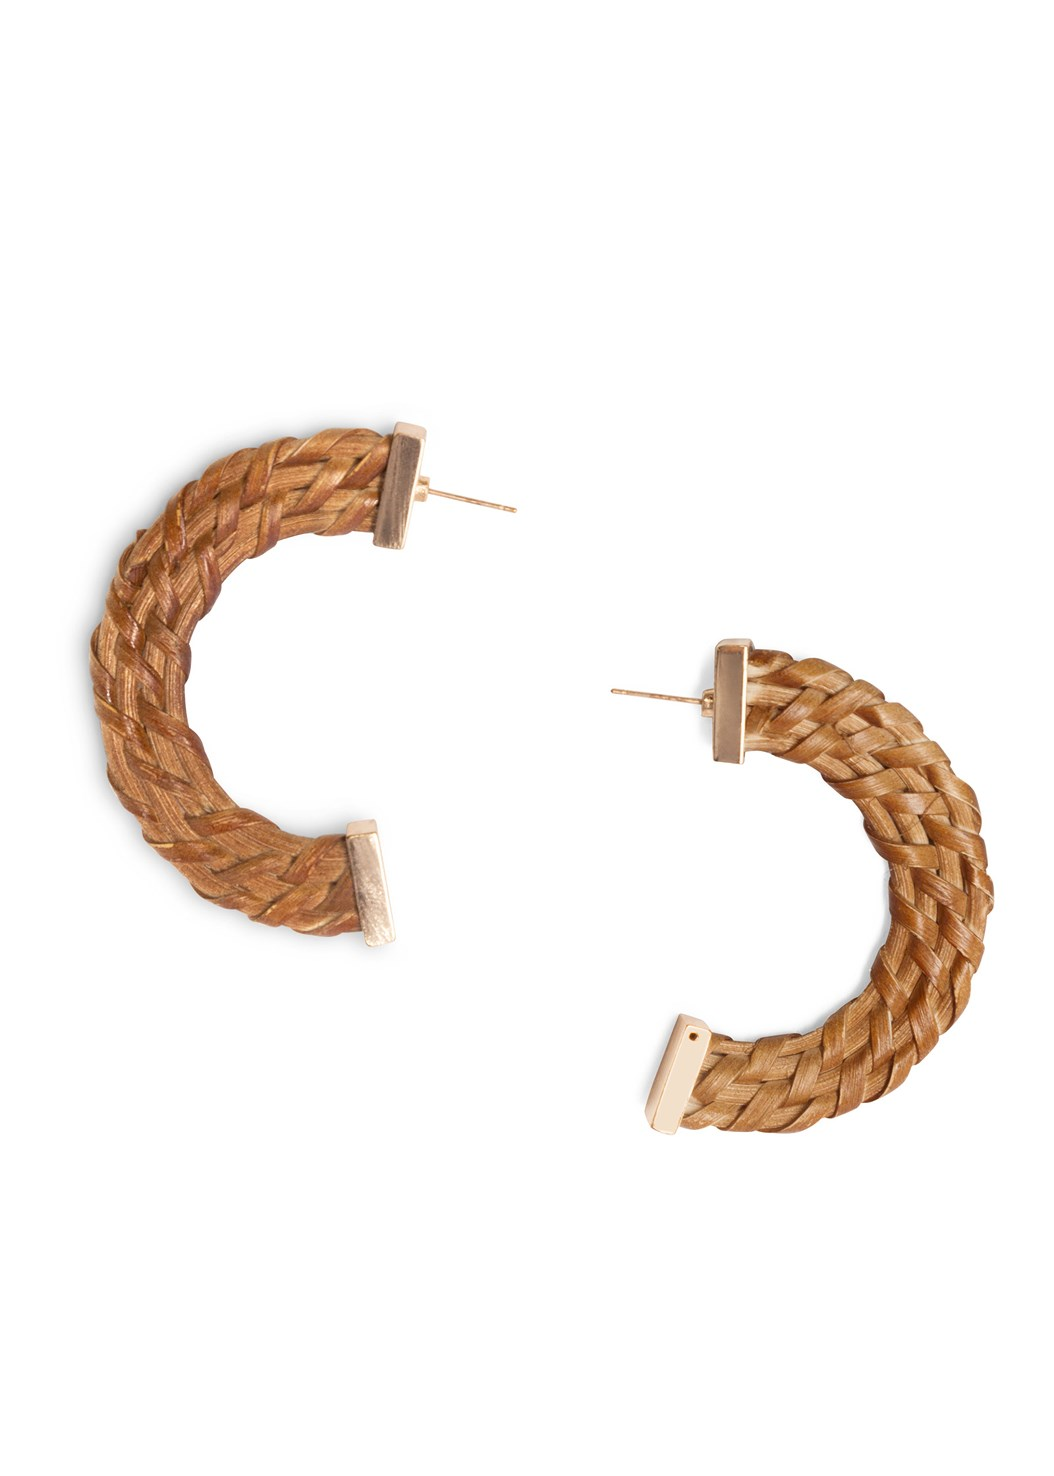 Raffia Hoop Earrings,Animal Print Dress,Wicker Straw Bag